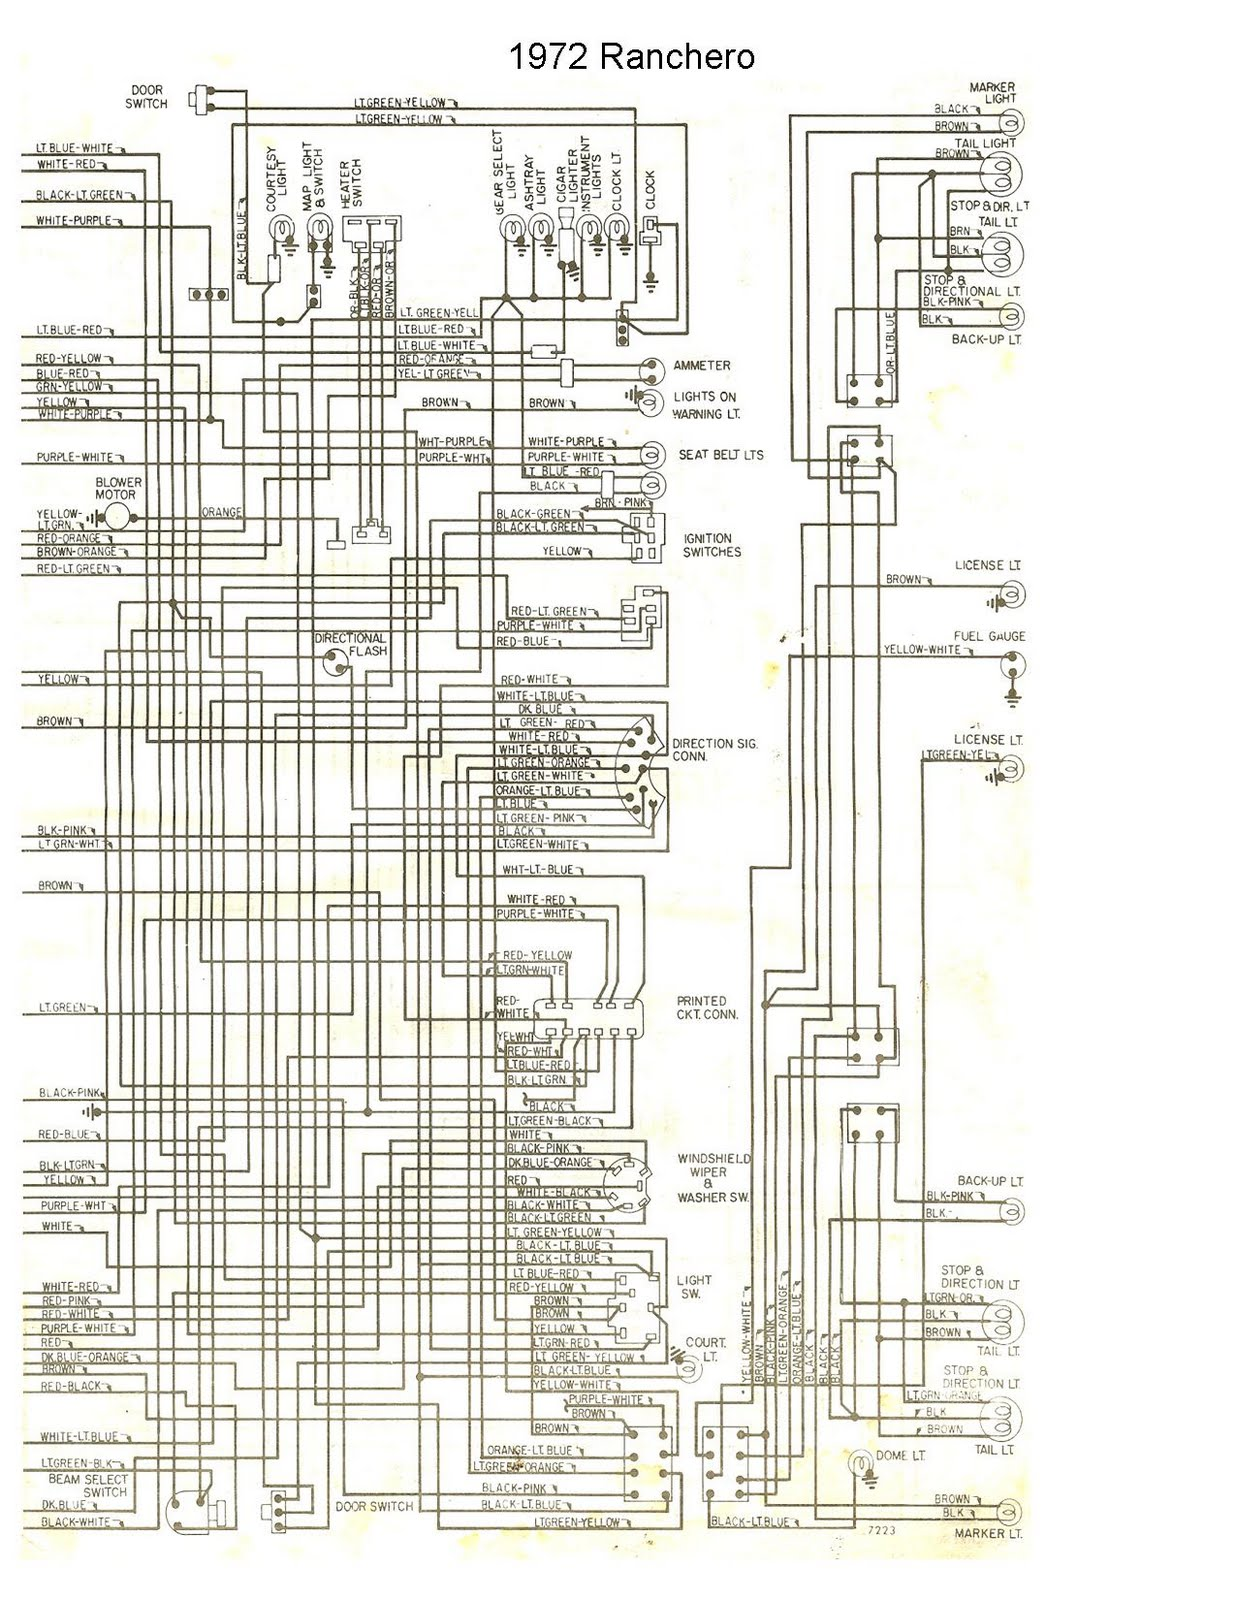 wiring schematic diagram ford ranchero 1972?w=500 1962 ford falcon wiring diagram